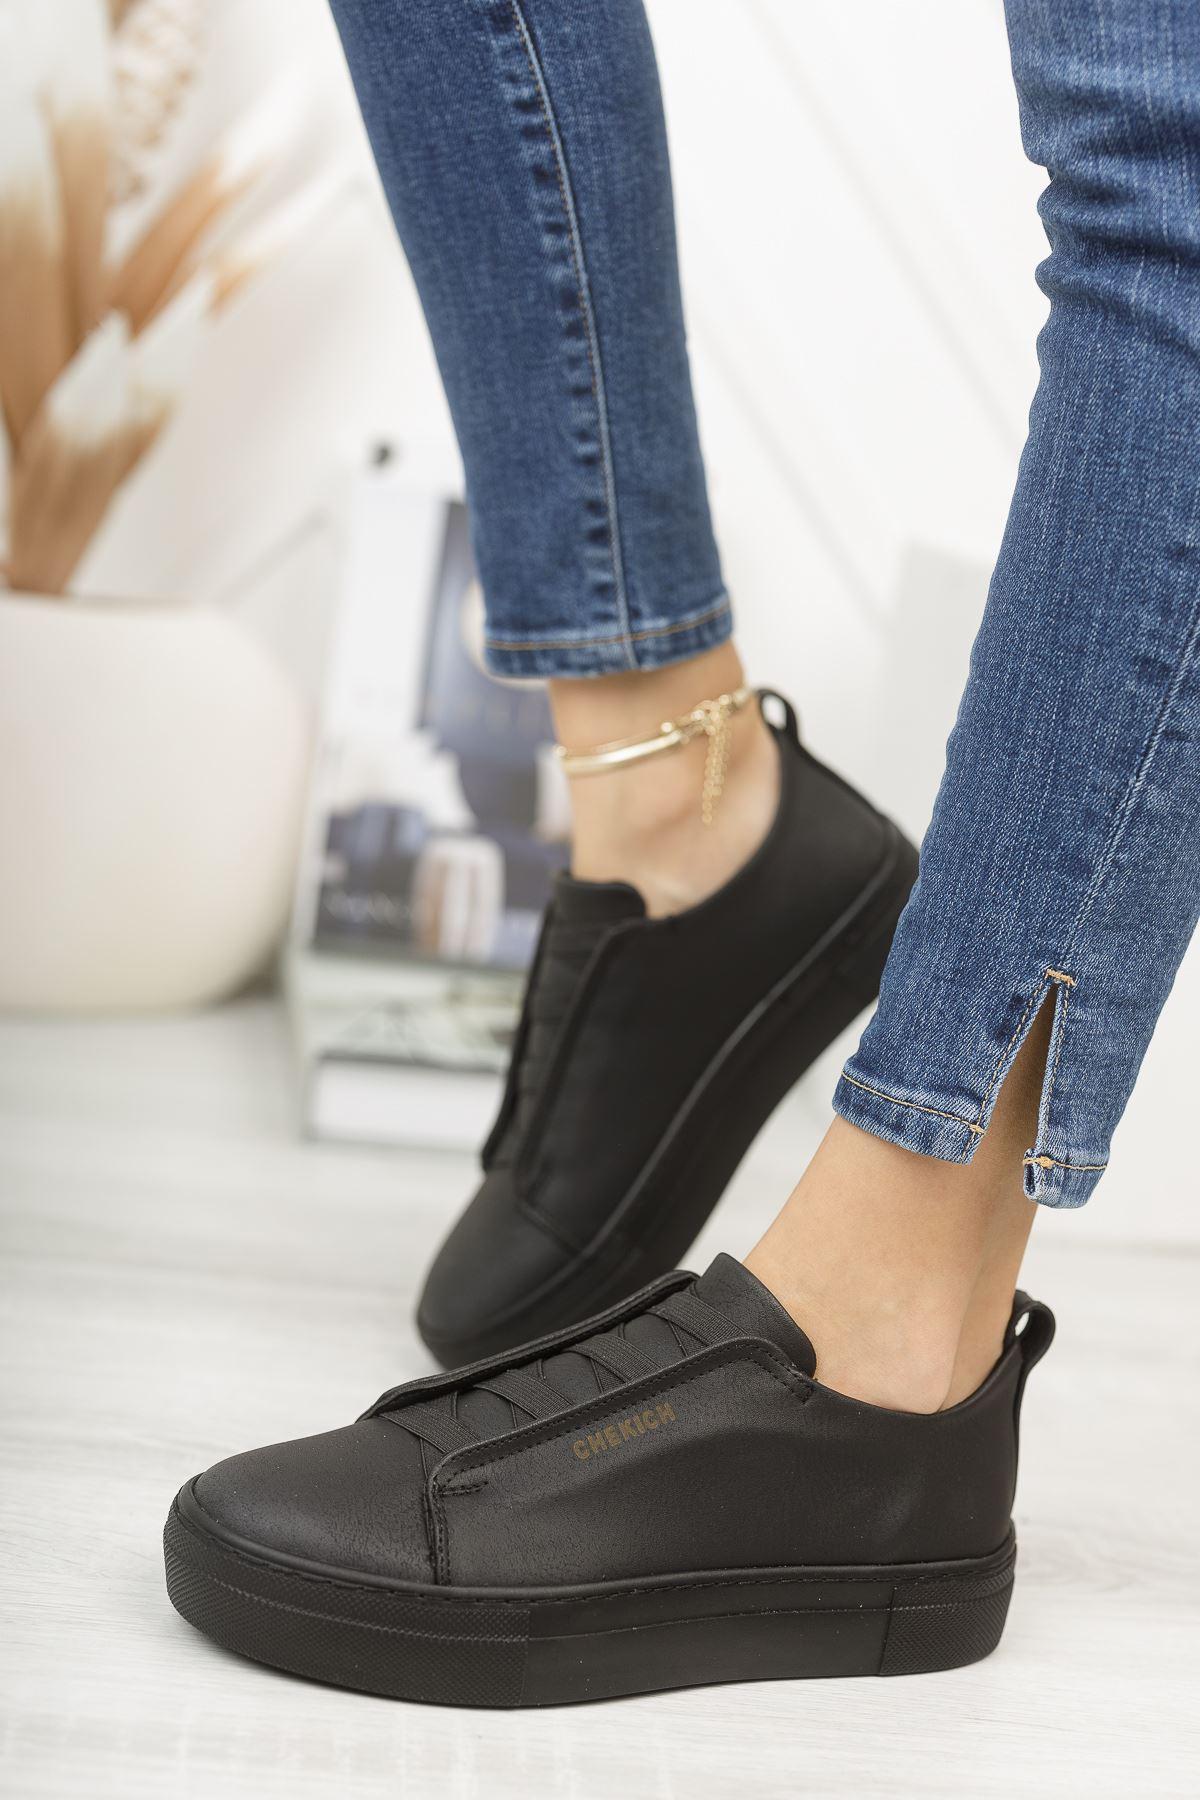 Chekich CH013 ST Kadın Ayakkabı SIYAH